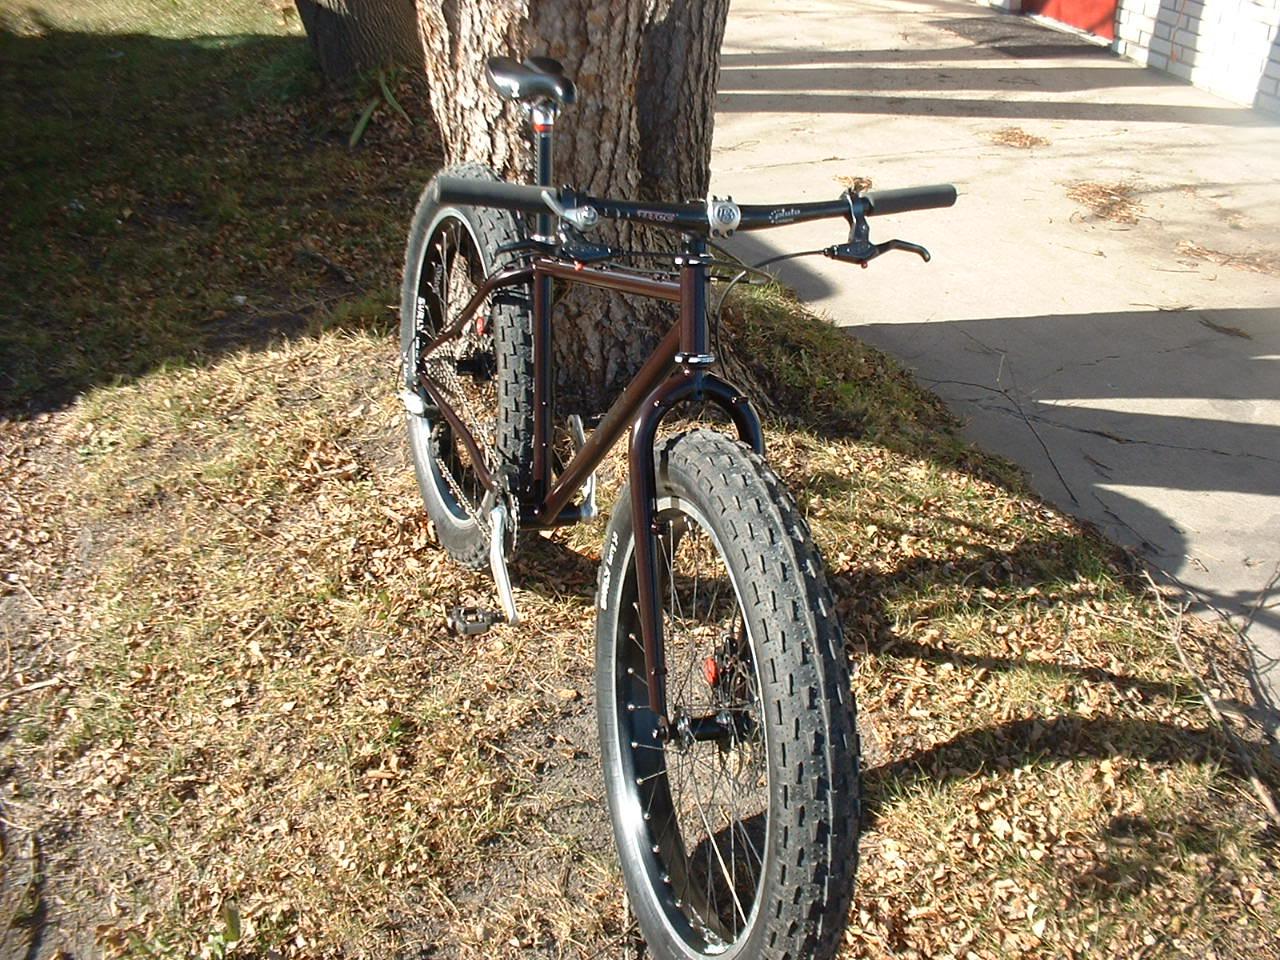 Daily fatbike pic thread-dscf0521.jpg